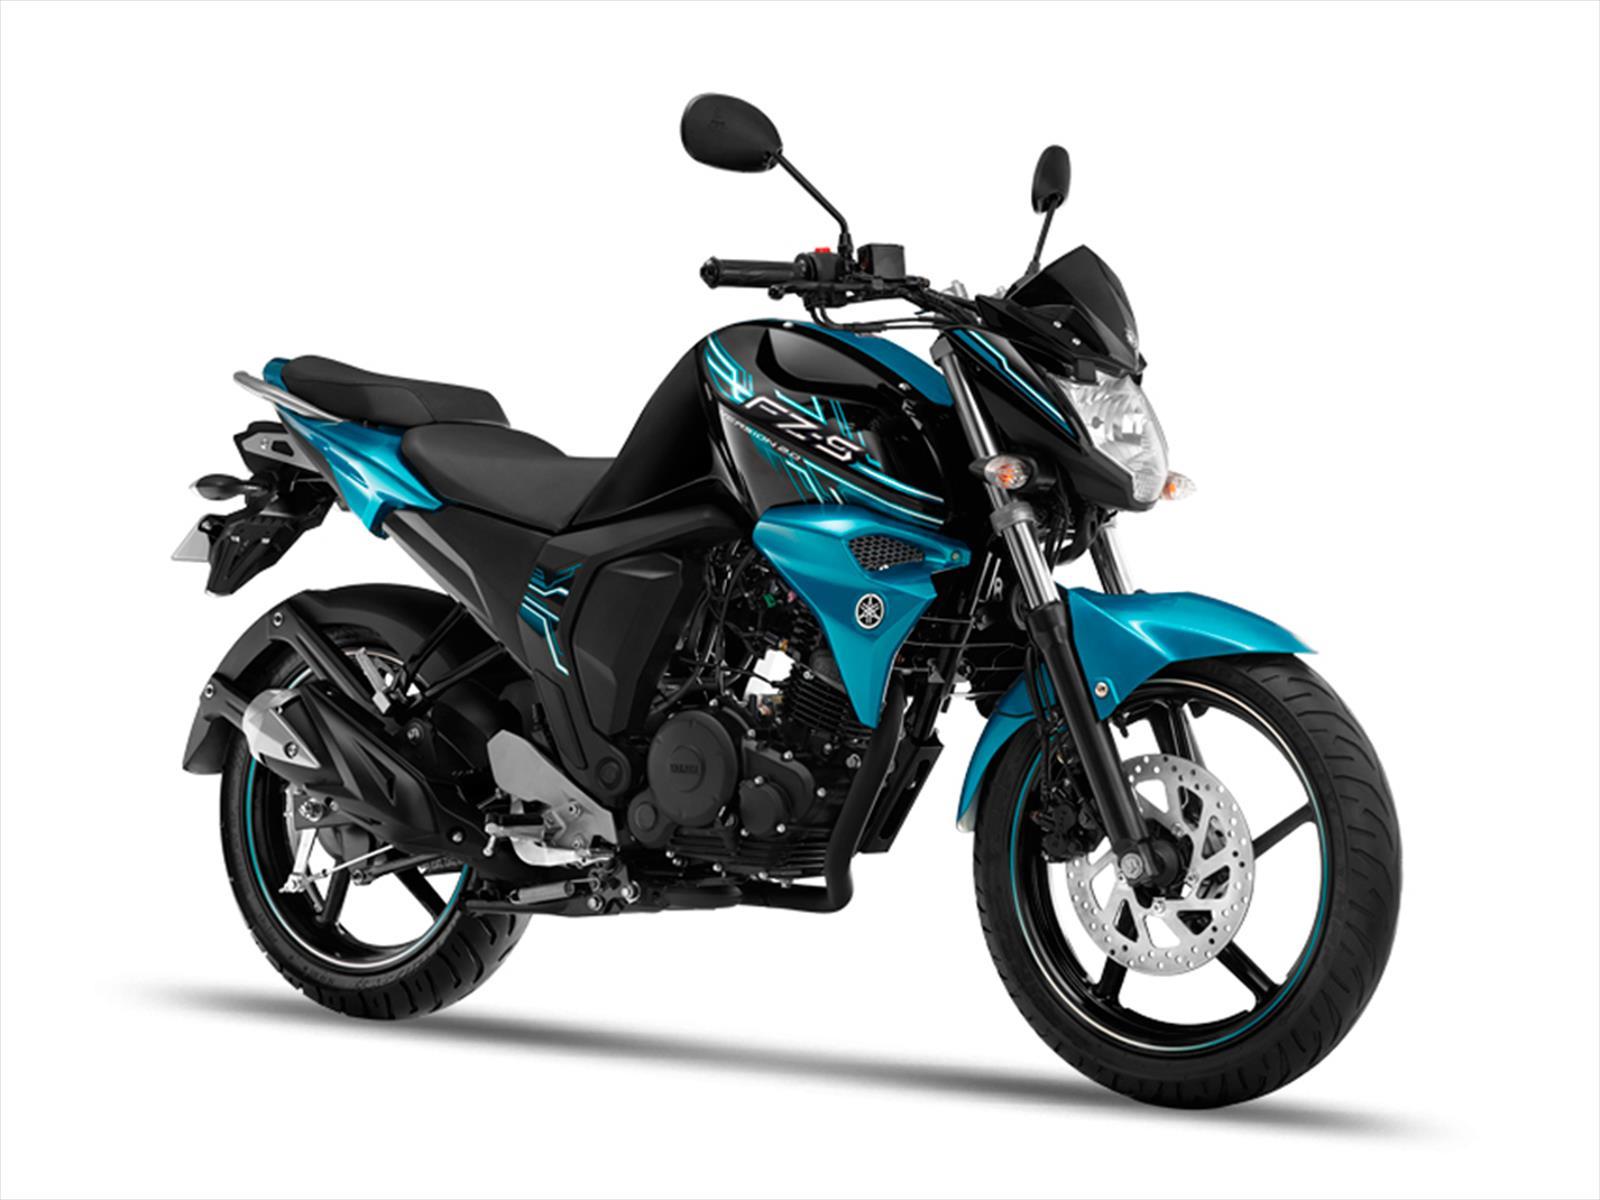 Yamaha FZ 2016 llega a México en $34,990 pesos ...